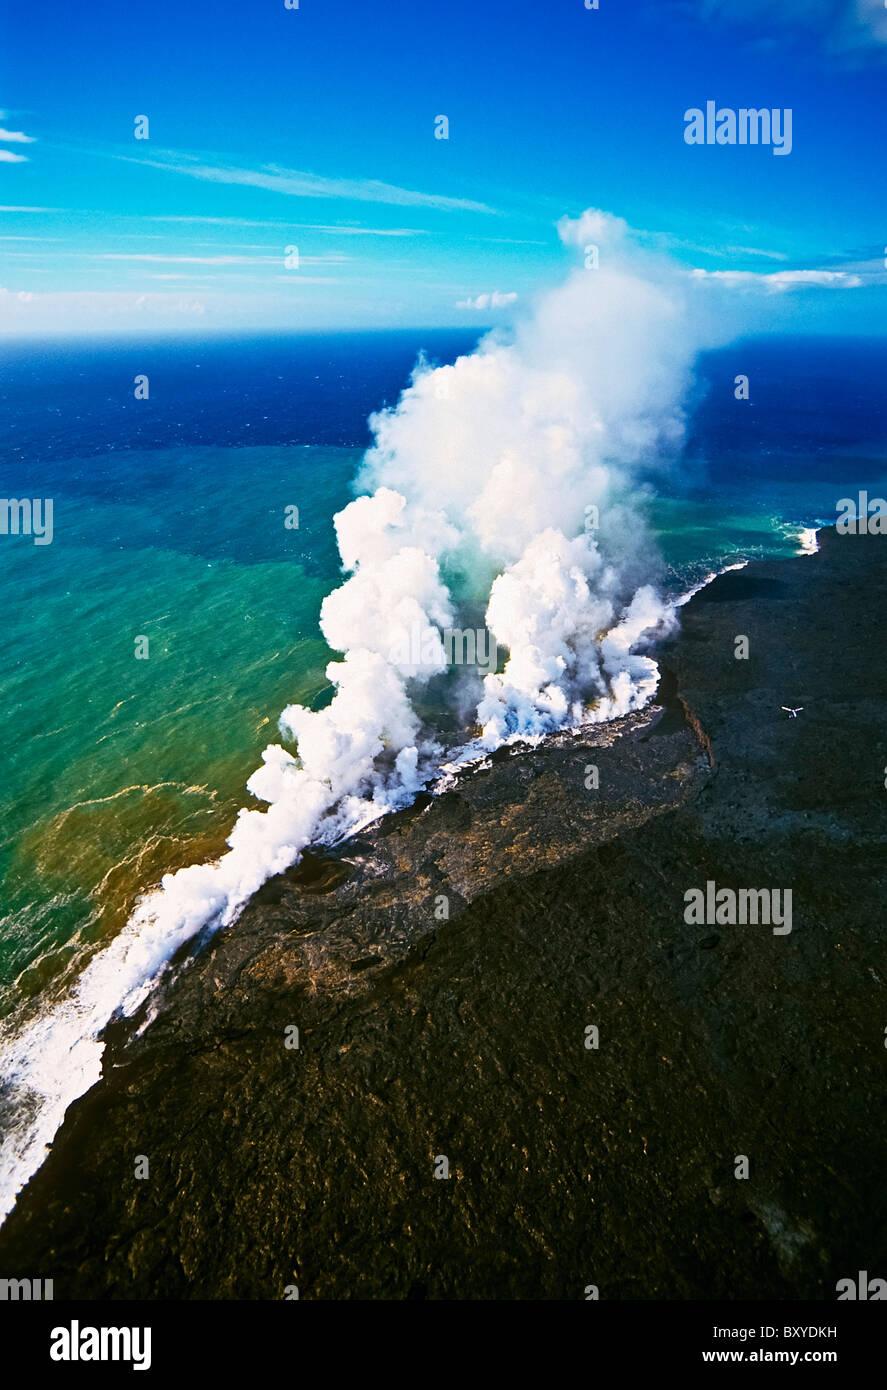 Di lava fusa entra freddo Oceano, vulcano Kilauea, Big Island, Hawaii, STATI UNITI D'AMERICA Immagini Stock